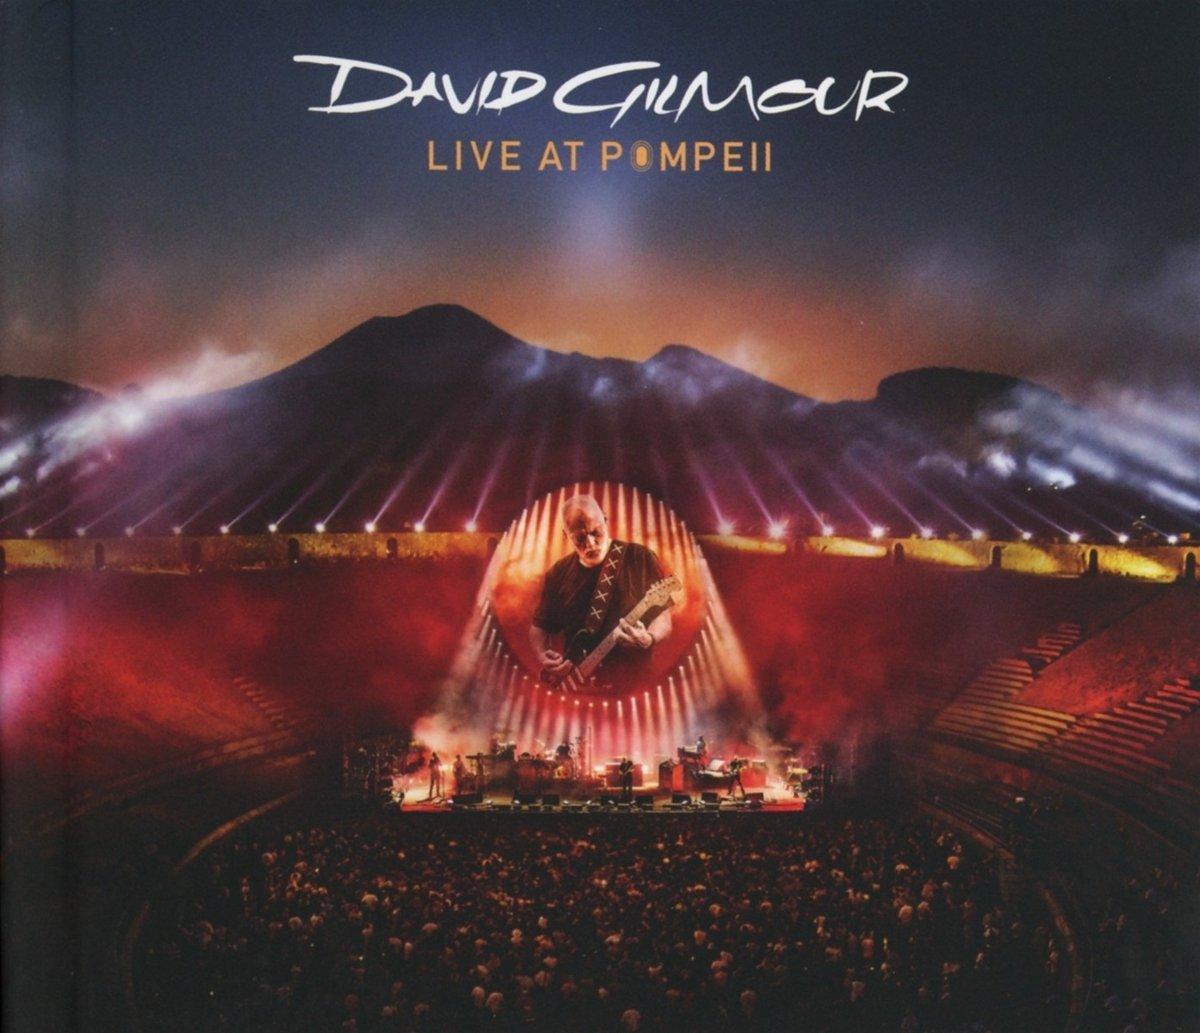 New Album Releases Live At Pompeii David Gilmour The